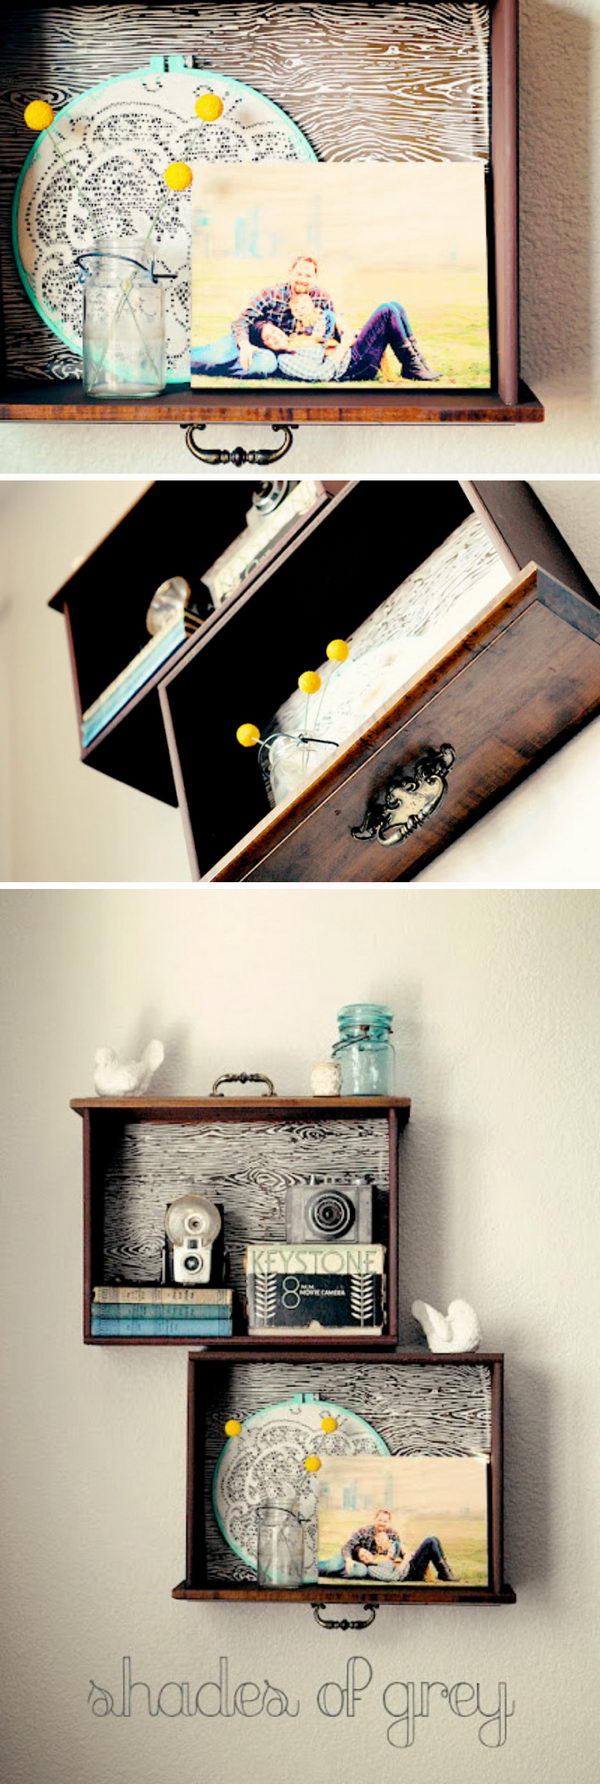 15 Diy Furniture Ideas Using Old Drawers 2017